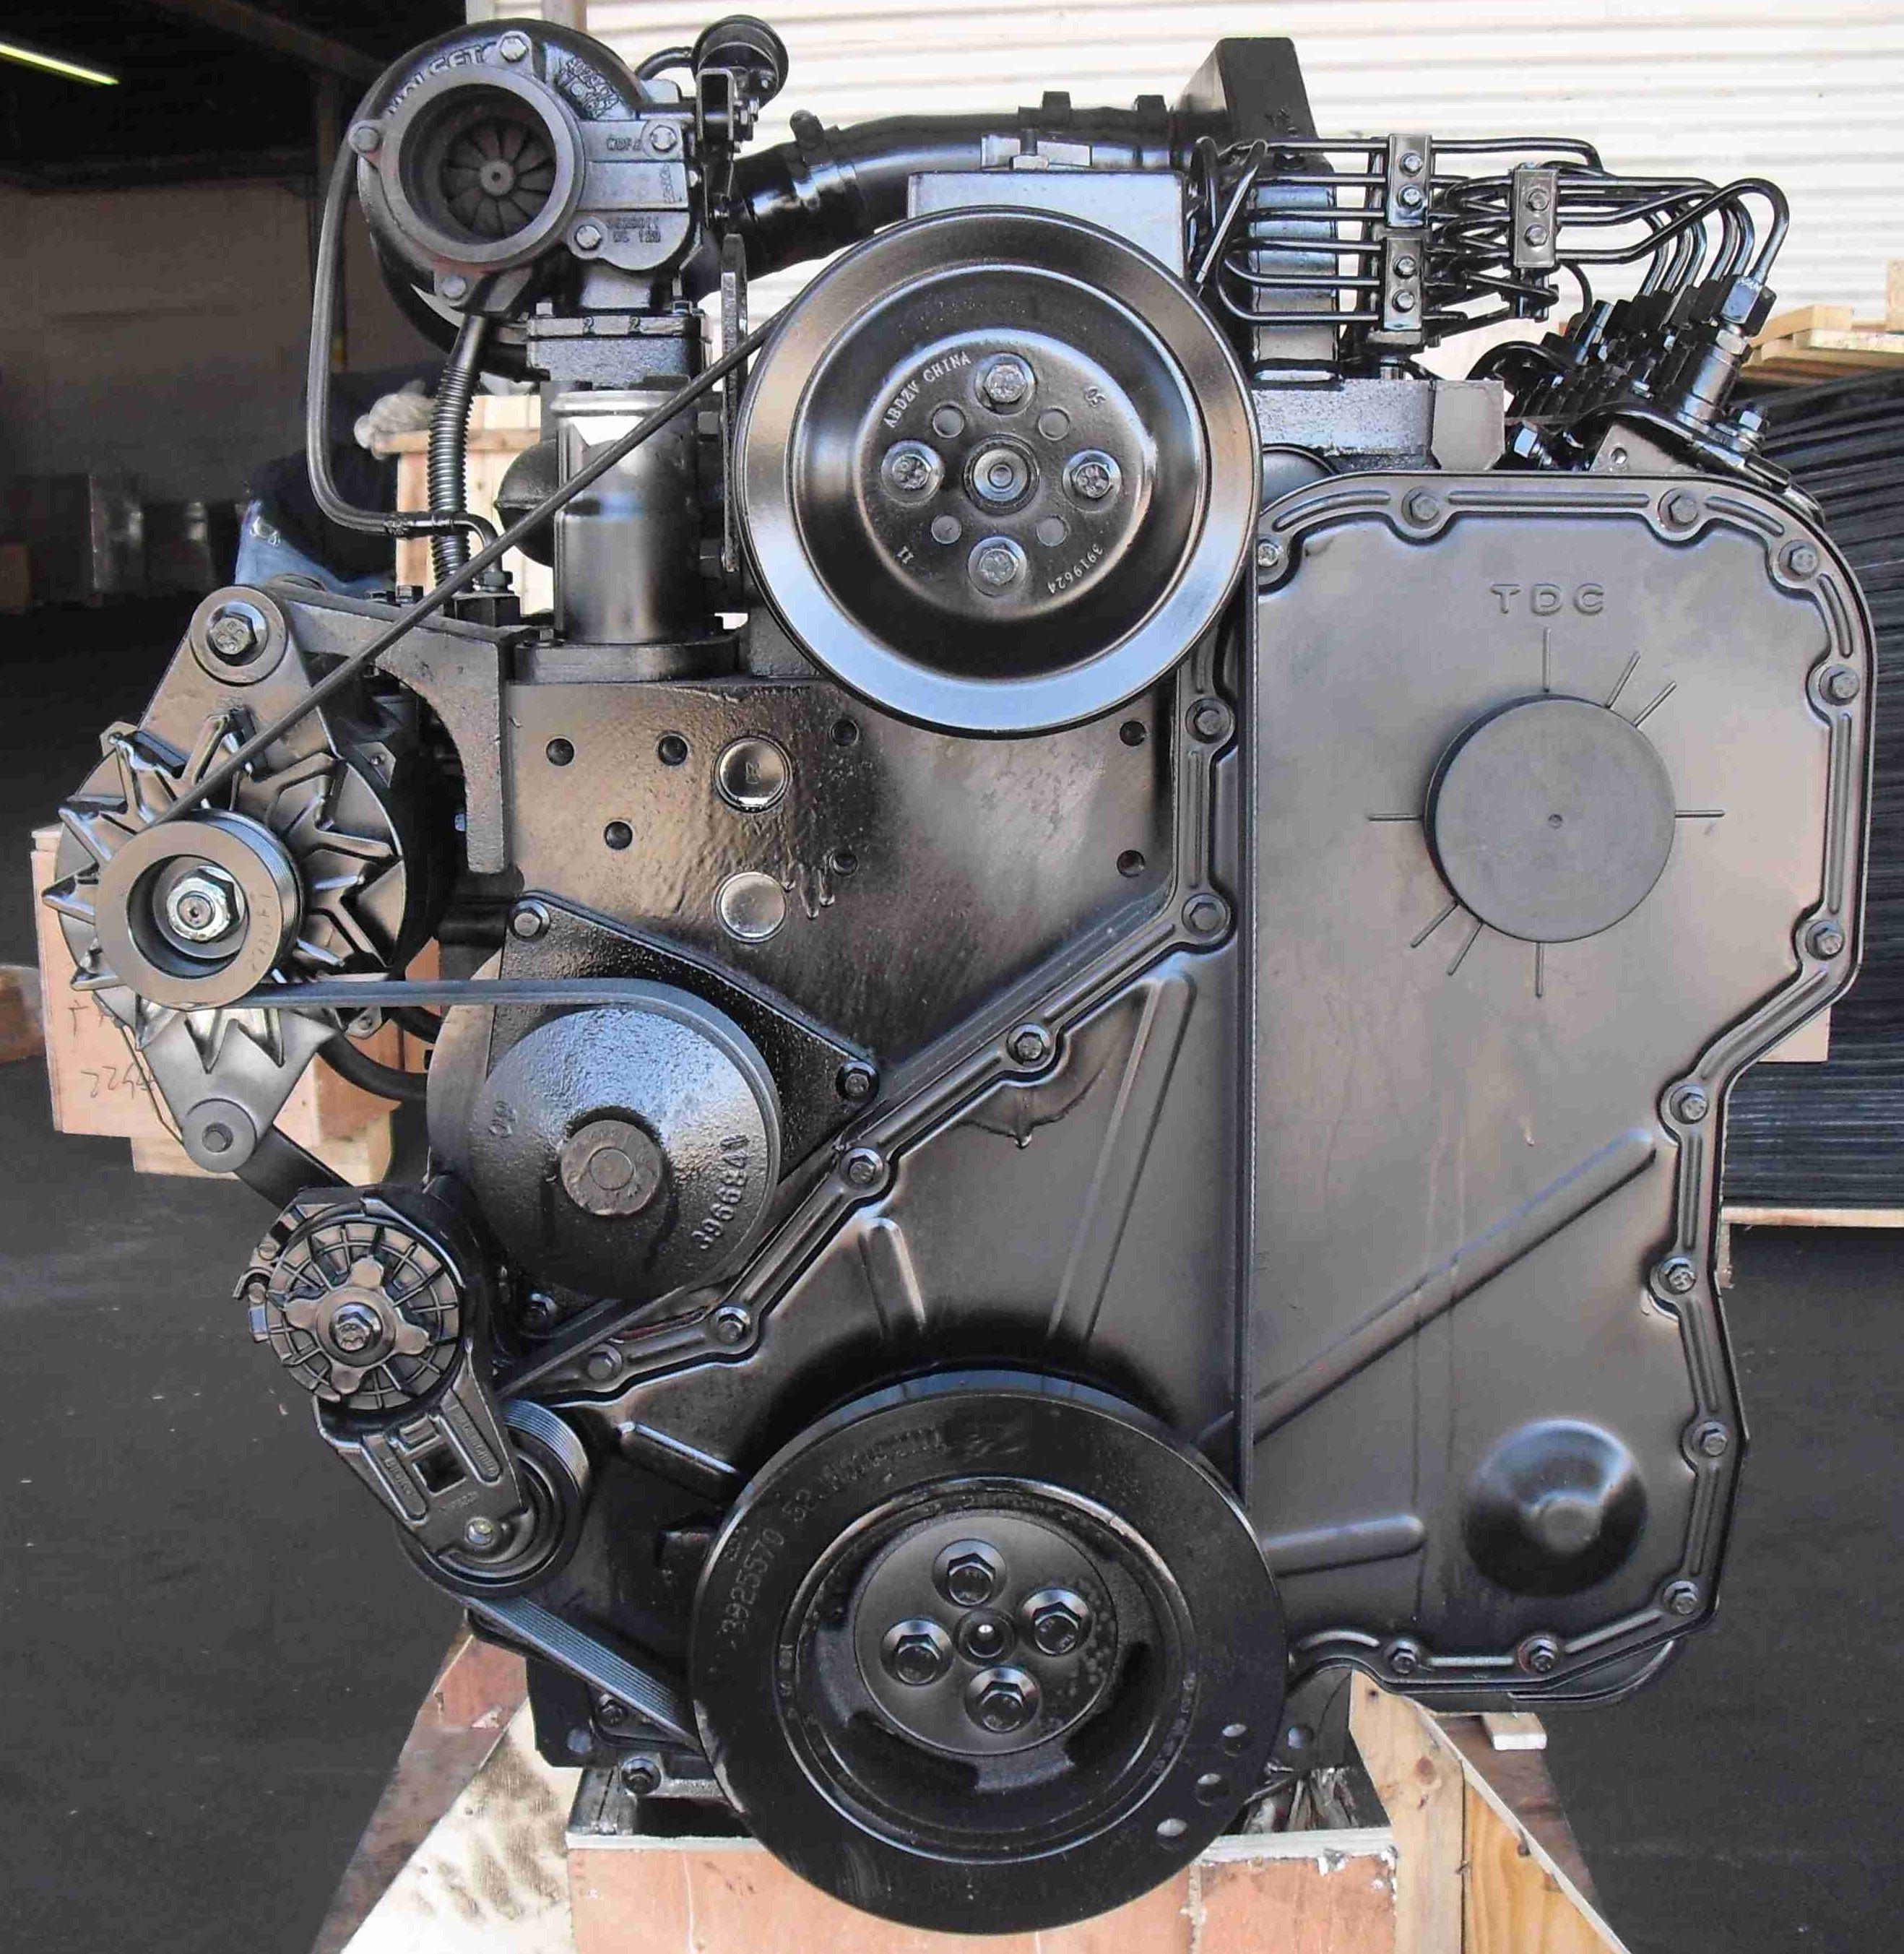 engine new cummins 6cta 8 3 cpl 722 top mount turbo 24 volt 6 cyl diesel. Black Bedroom Furniture Sets. Home Design Ideas